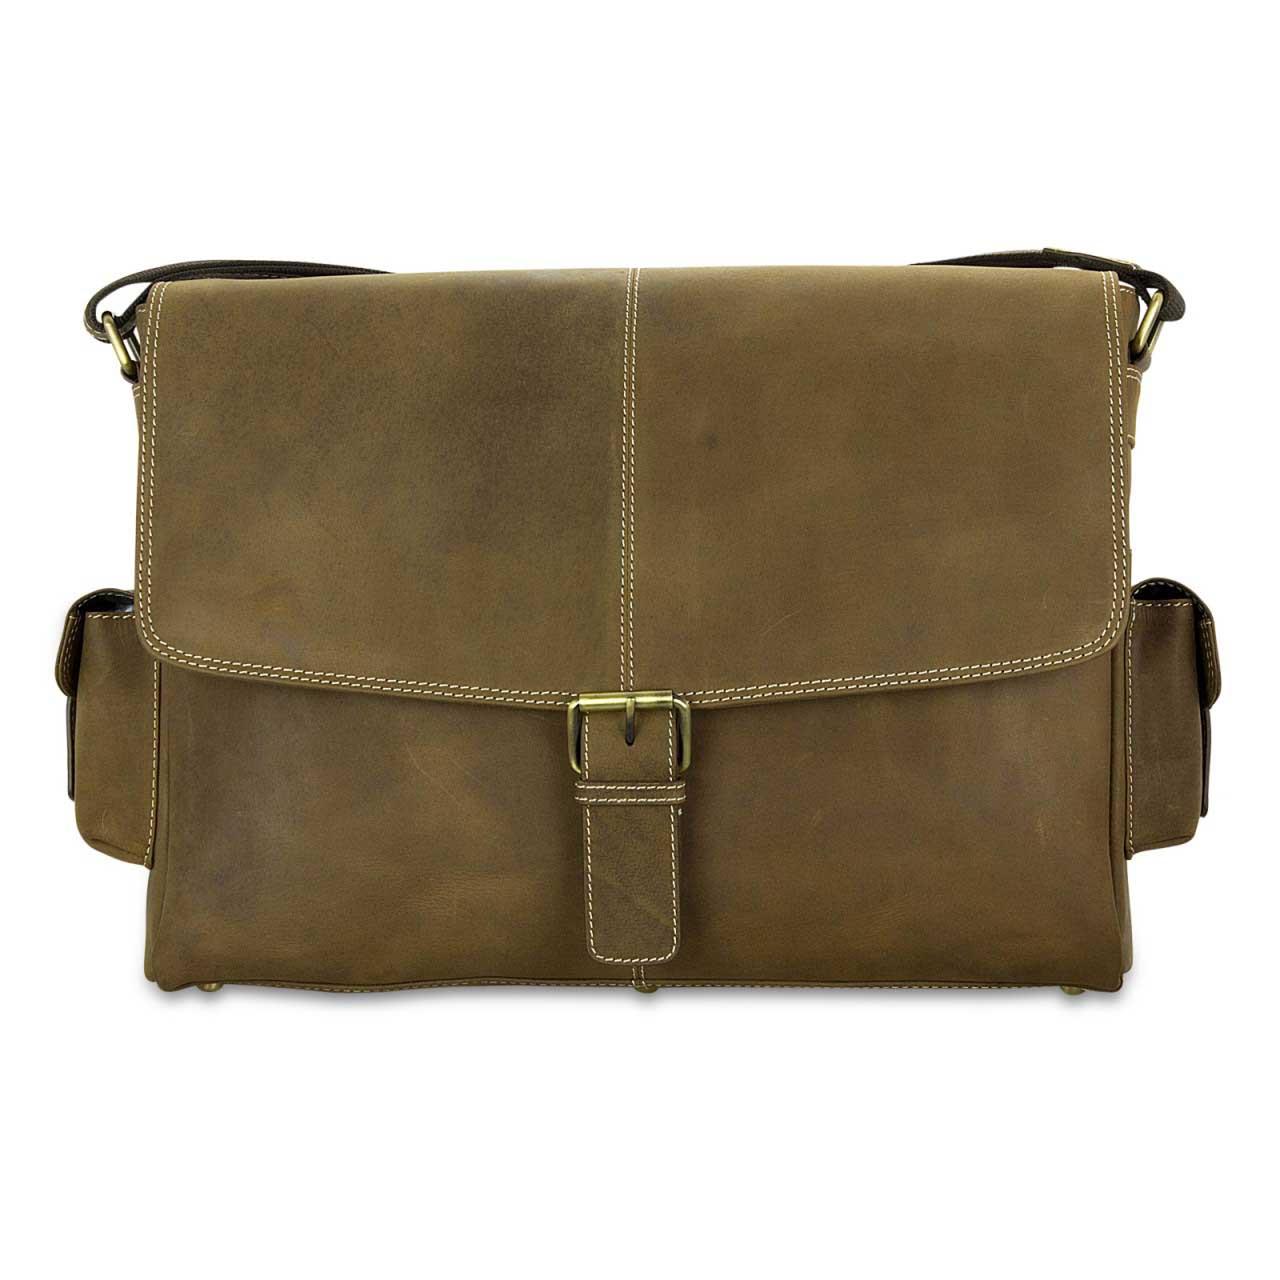 STILORD Ledertasche Umhängetasche 15.6 Zoll Laptoptasche aus echtem Büffel-Leder braun  - Bild 3